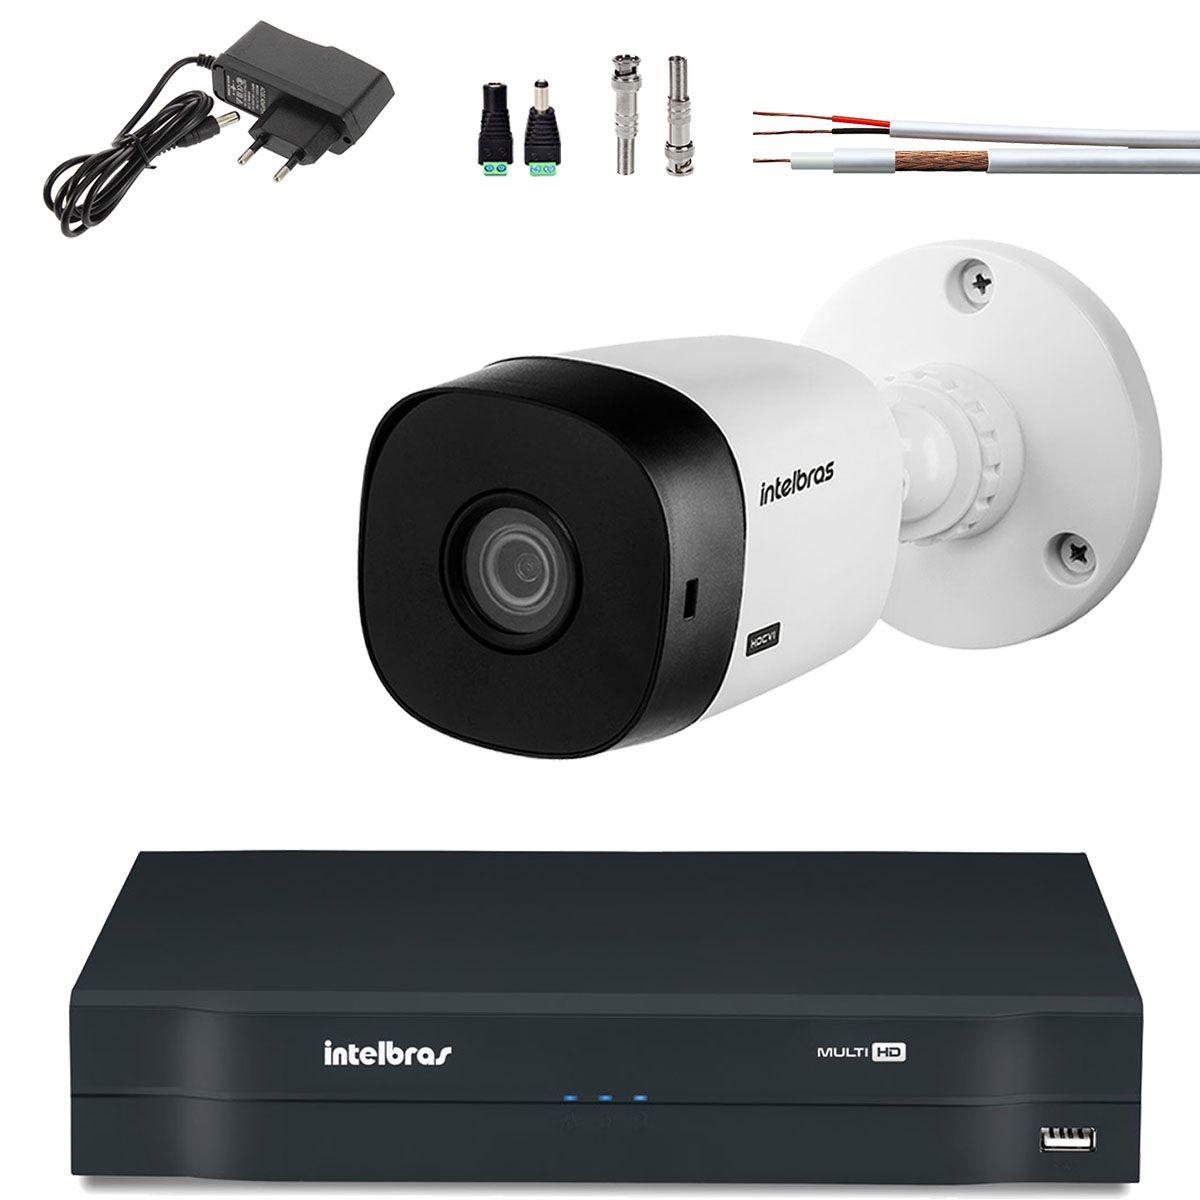 Kit 1 Camera Bullet Intelbras Hd 720p Hdcvi Vhl 1120 B 100Mts Cabo